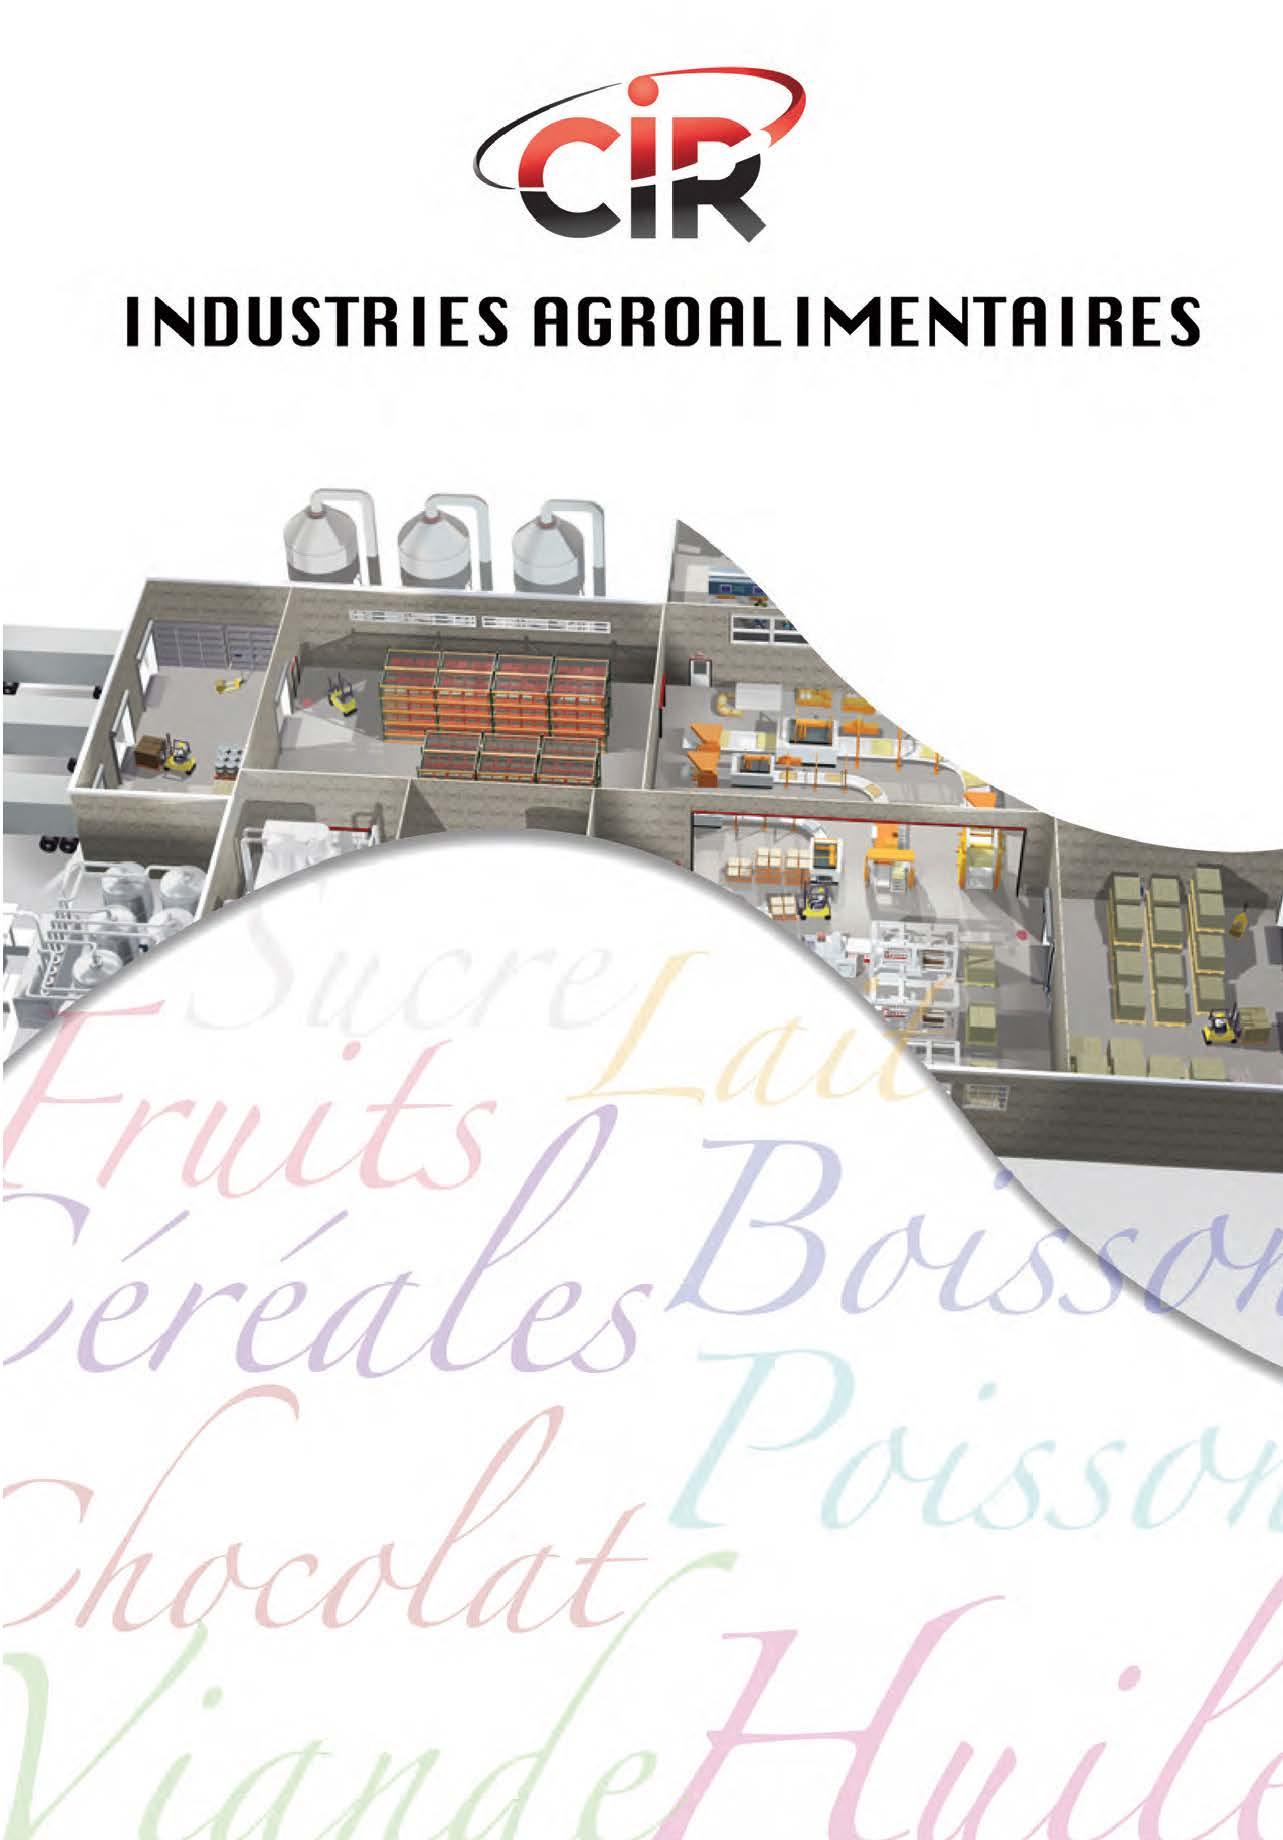 CIR industrie agroalimentaire